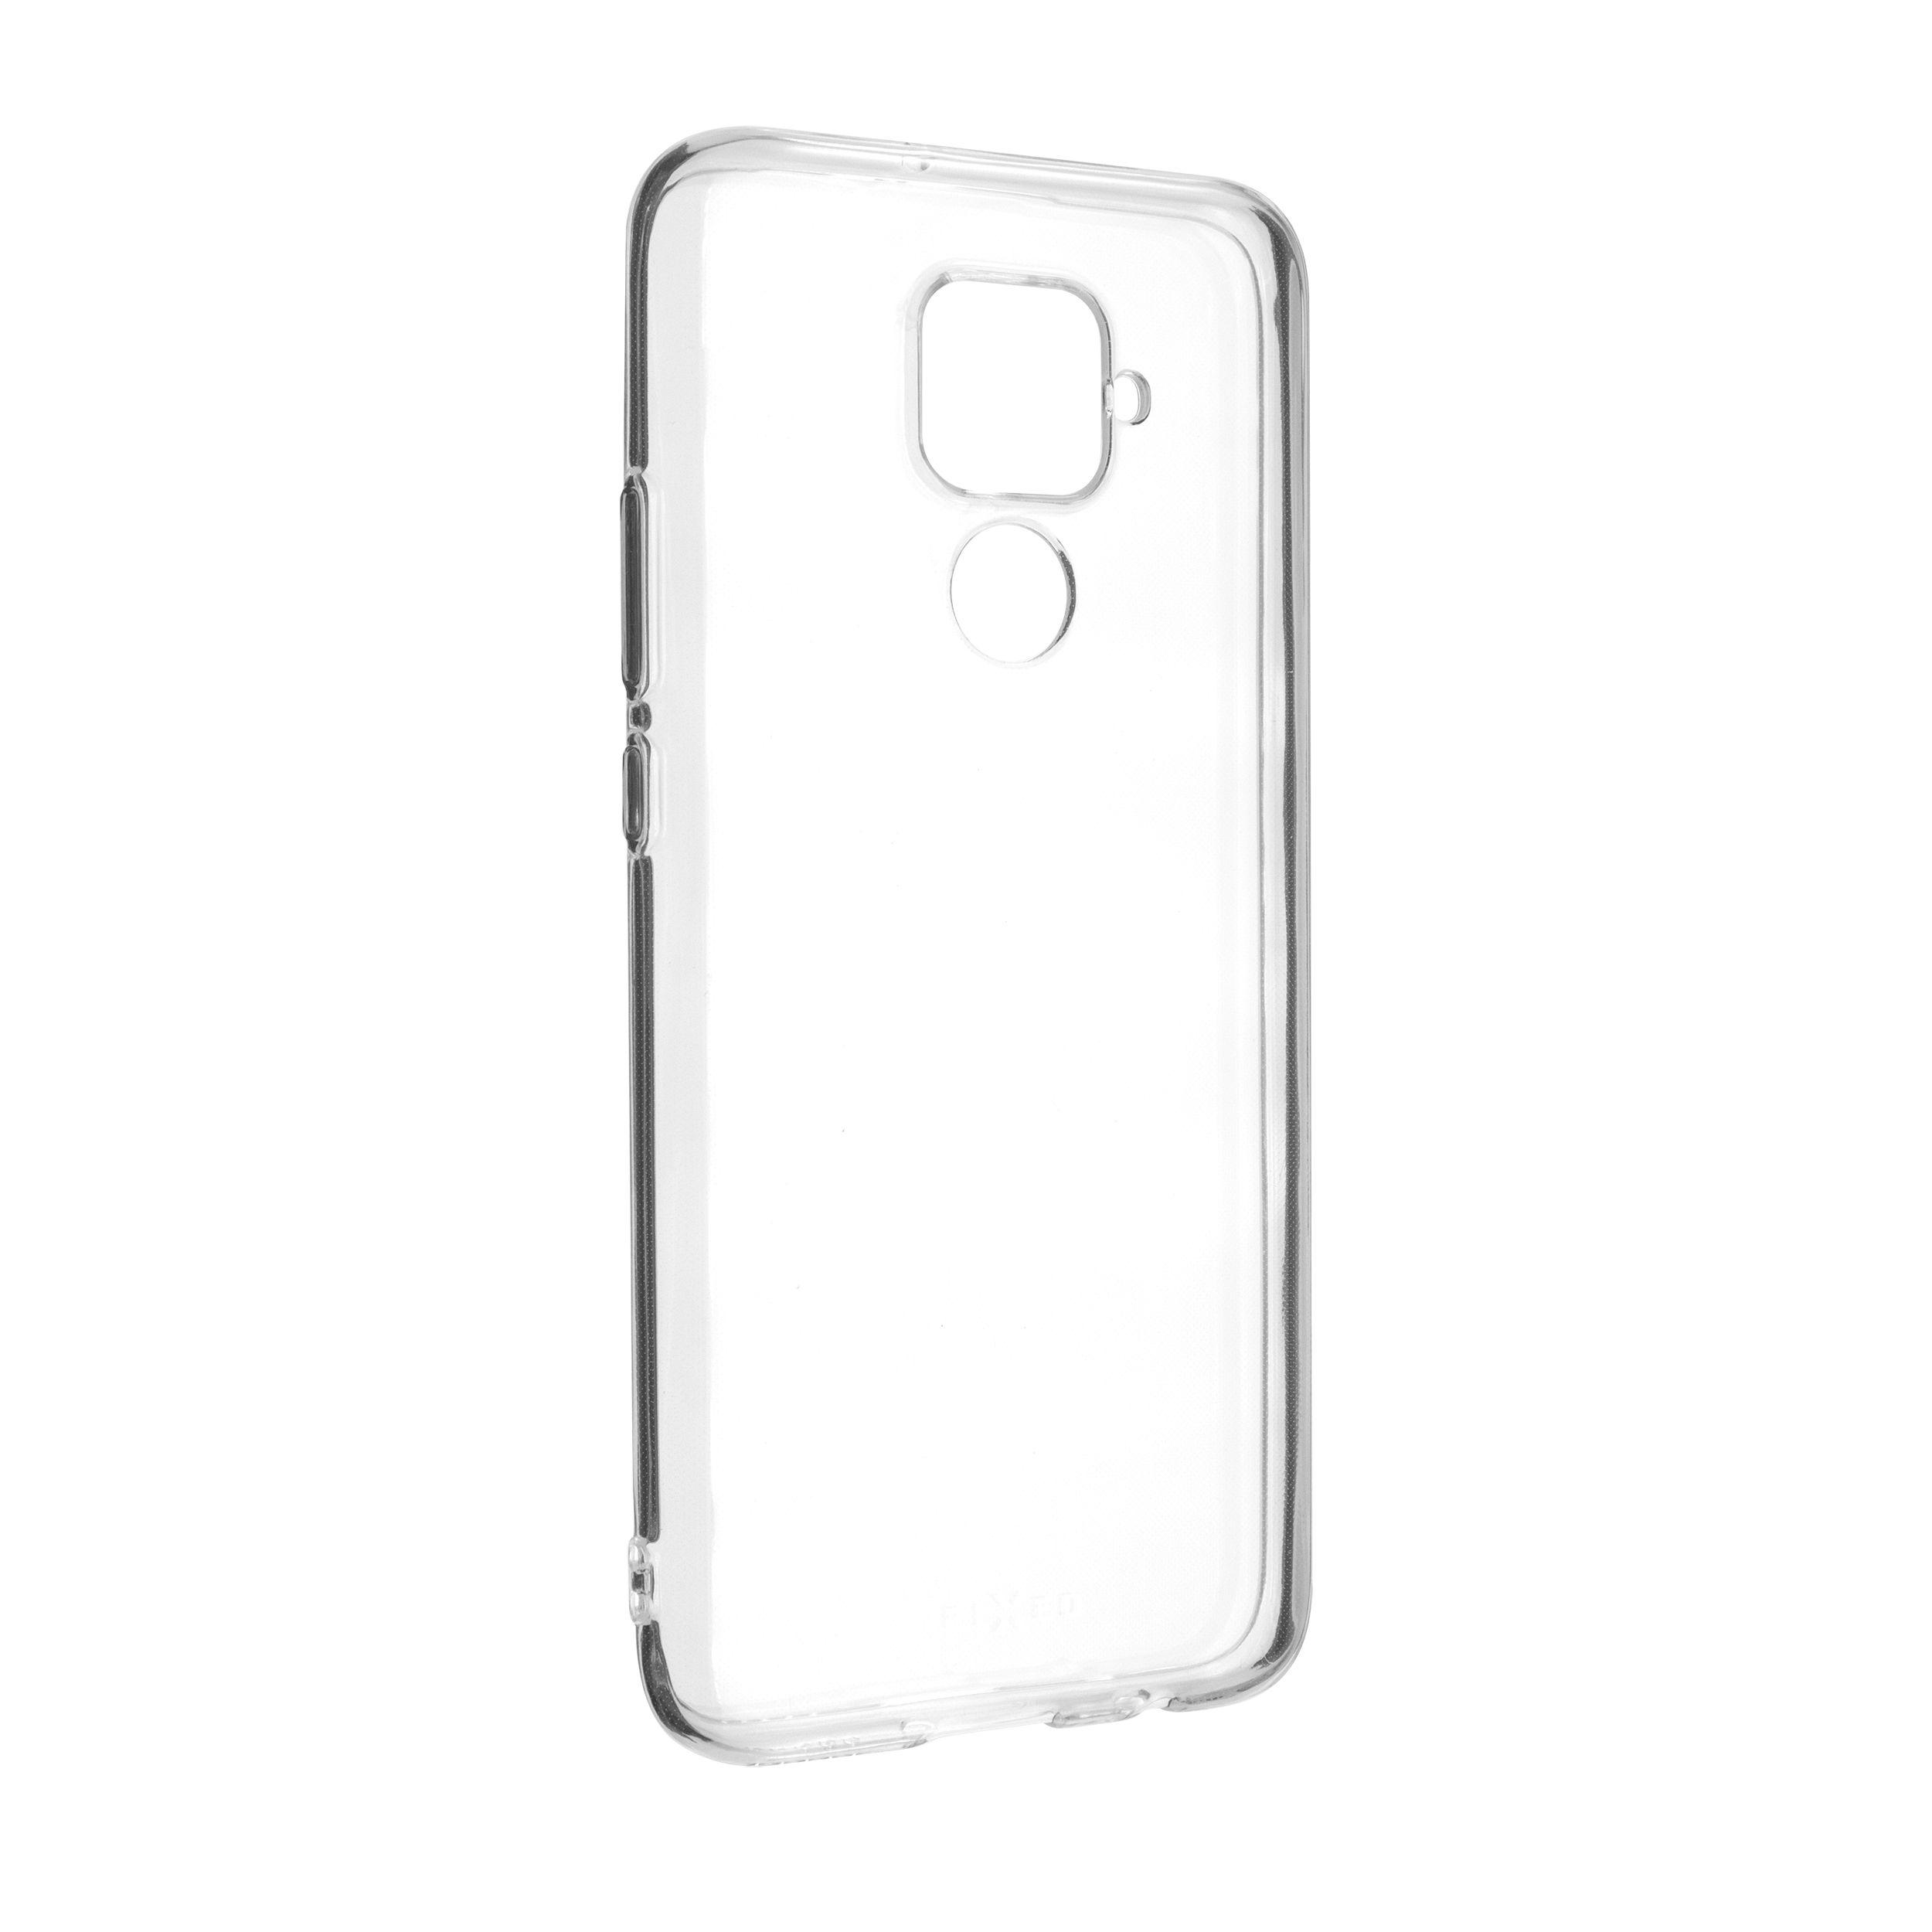 TPU gelové pouzdro FIXED pro Huawei Mate 30 Lite, čiré